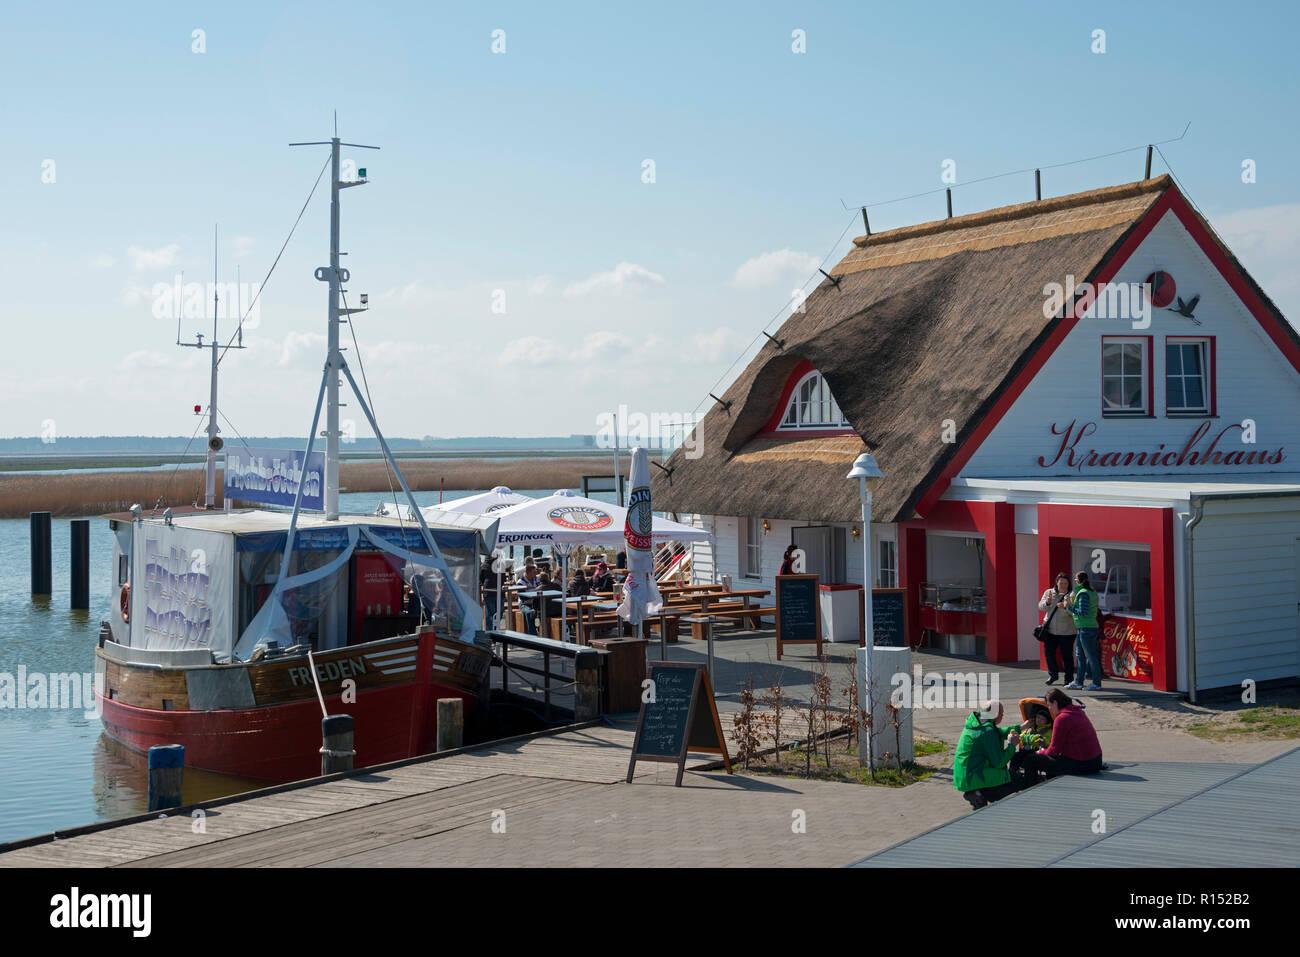 Trawler Frieden and Kranichhaus, Zingst, Mecklenburg-Western Pomerania, Germany - Stock Image